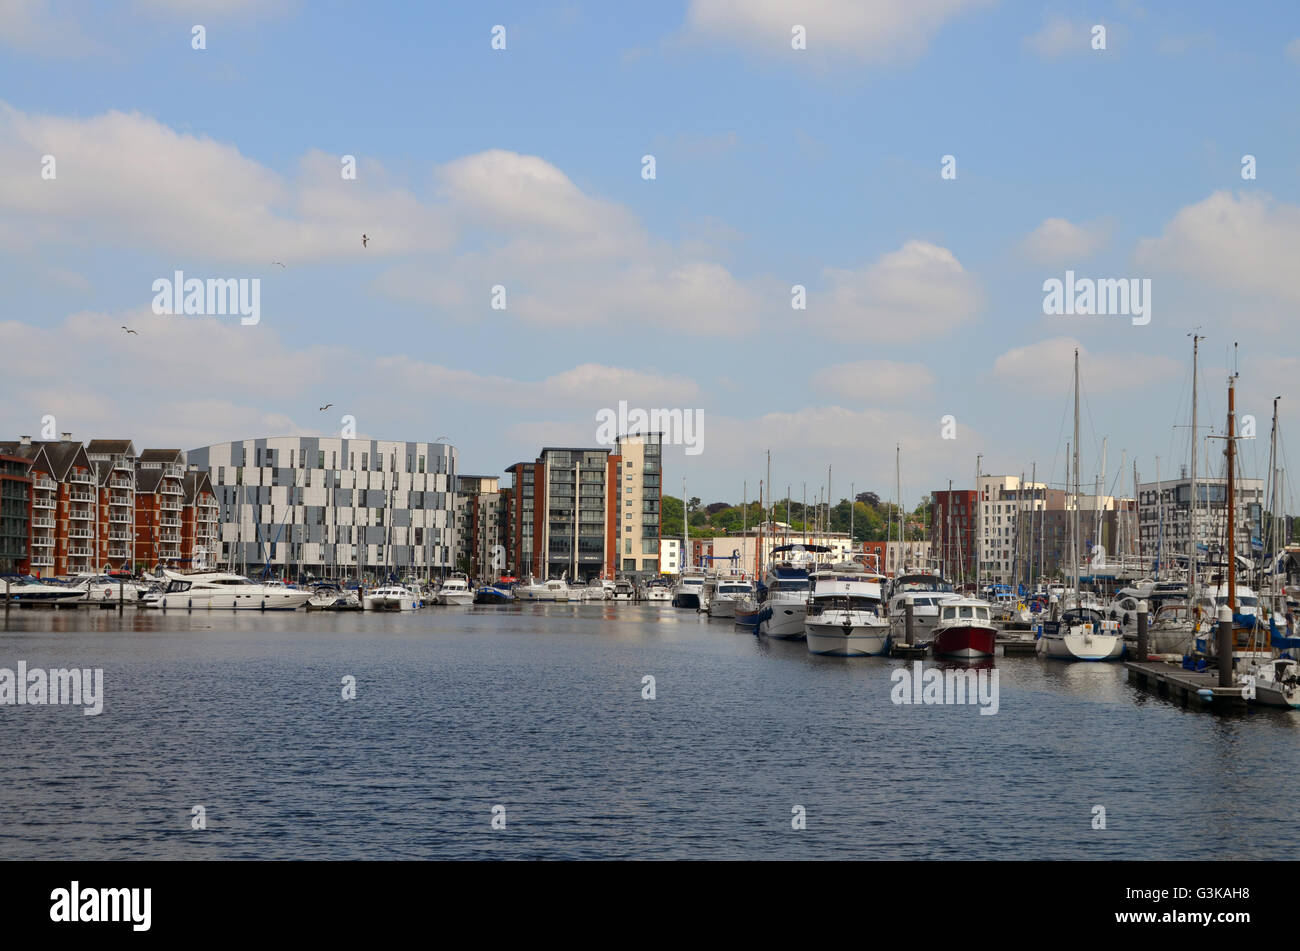 Waterfront, Ipswich docks, Suffolk 2016 - Stock Image